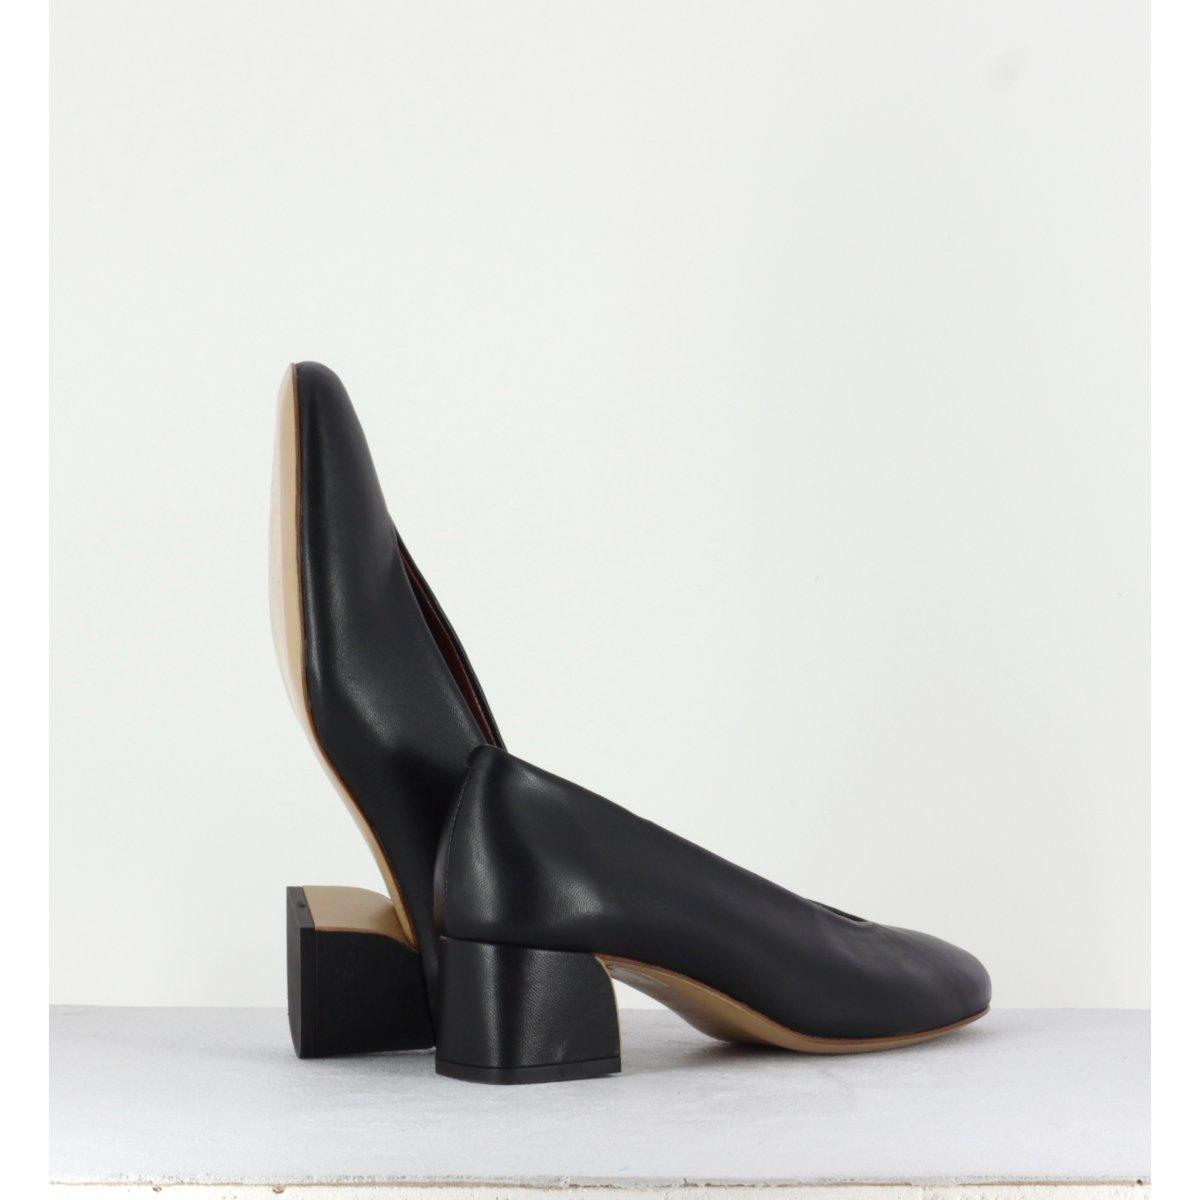 Escarpins à talons noir ROPE N2N- Avril Gau